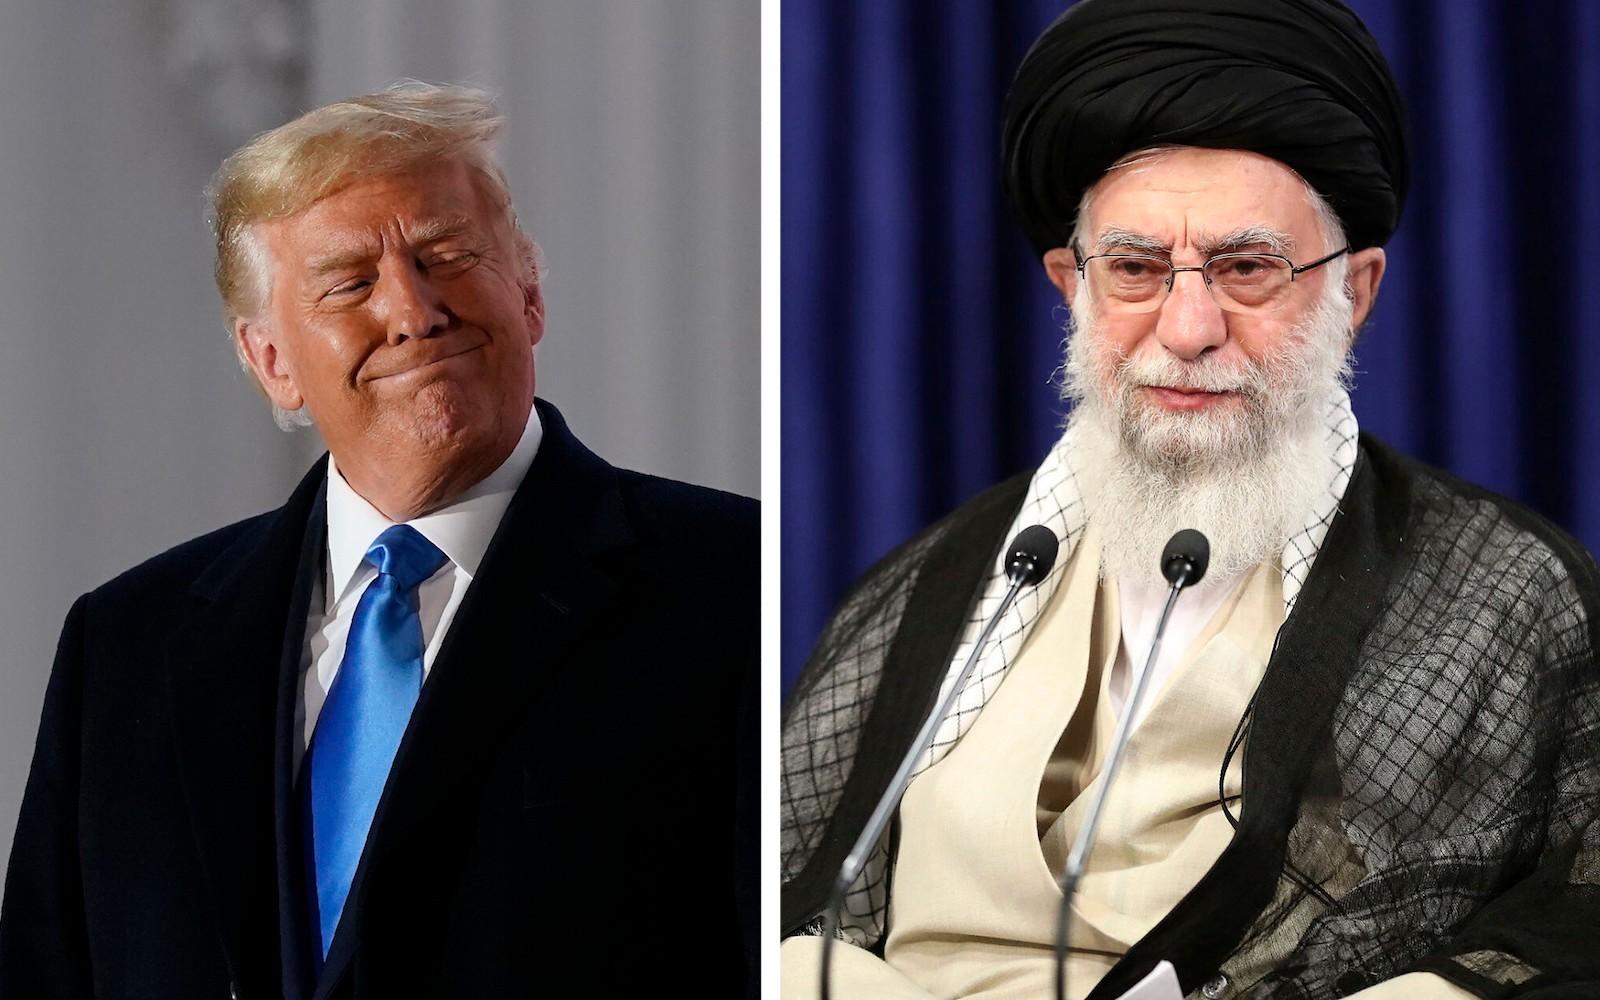 Trump demolished liberals' Mideast fallacies – he had help from Iran